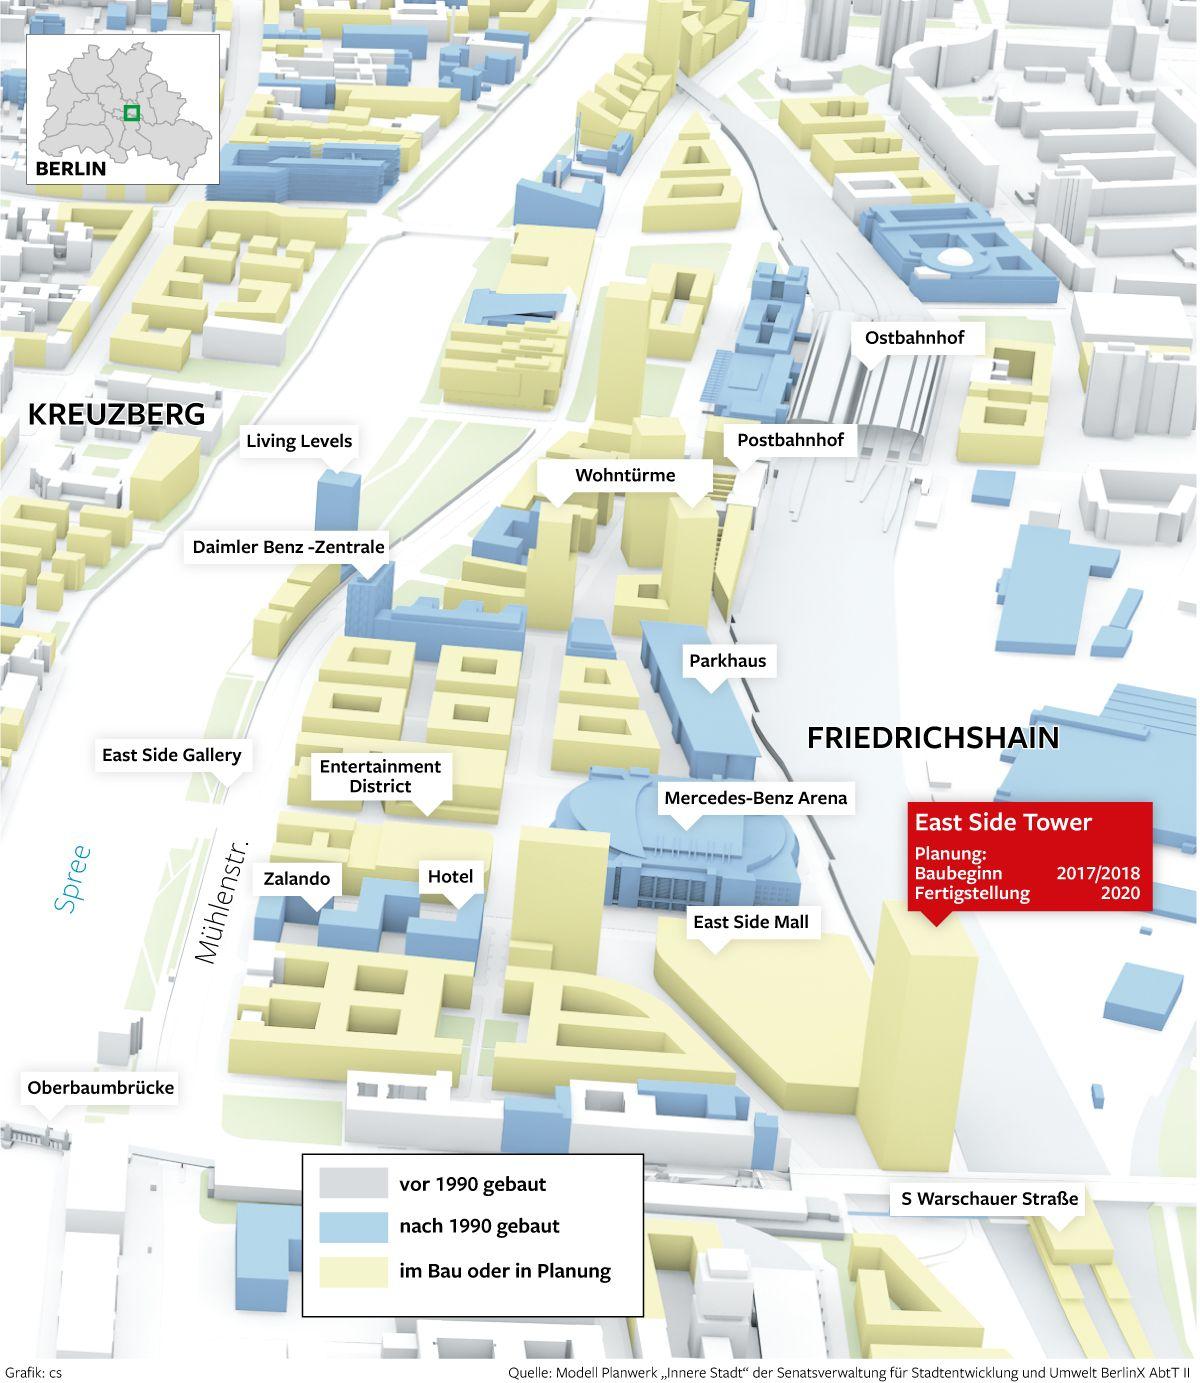 bauvorhaben rings um die mercedes benz arena in berlin mit dem east side tower entsteht neben. Black Bedroom Furniture Sets. Home Design Ideas